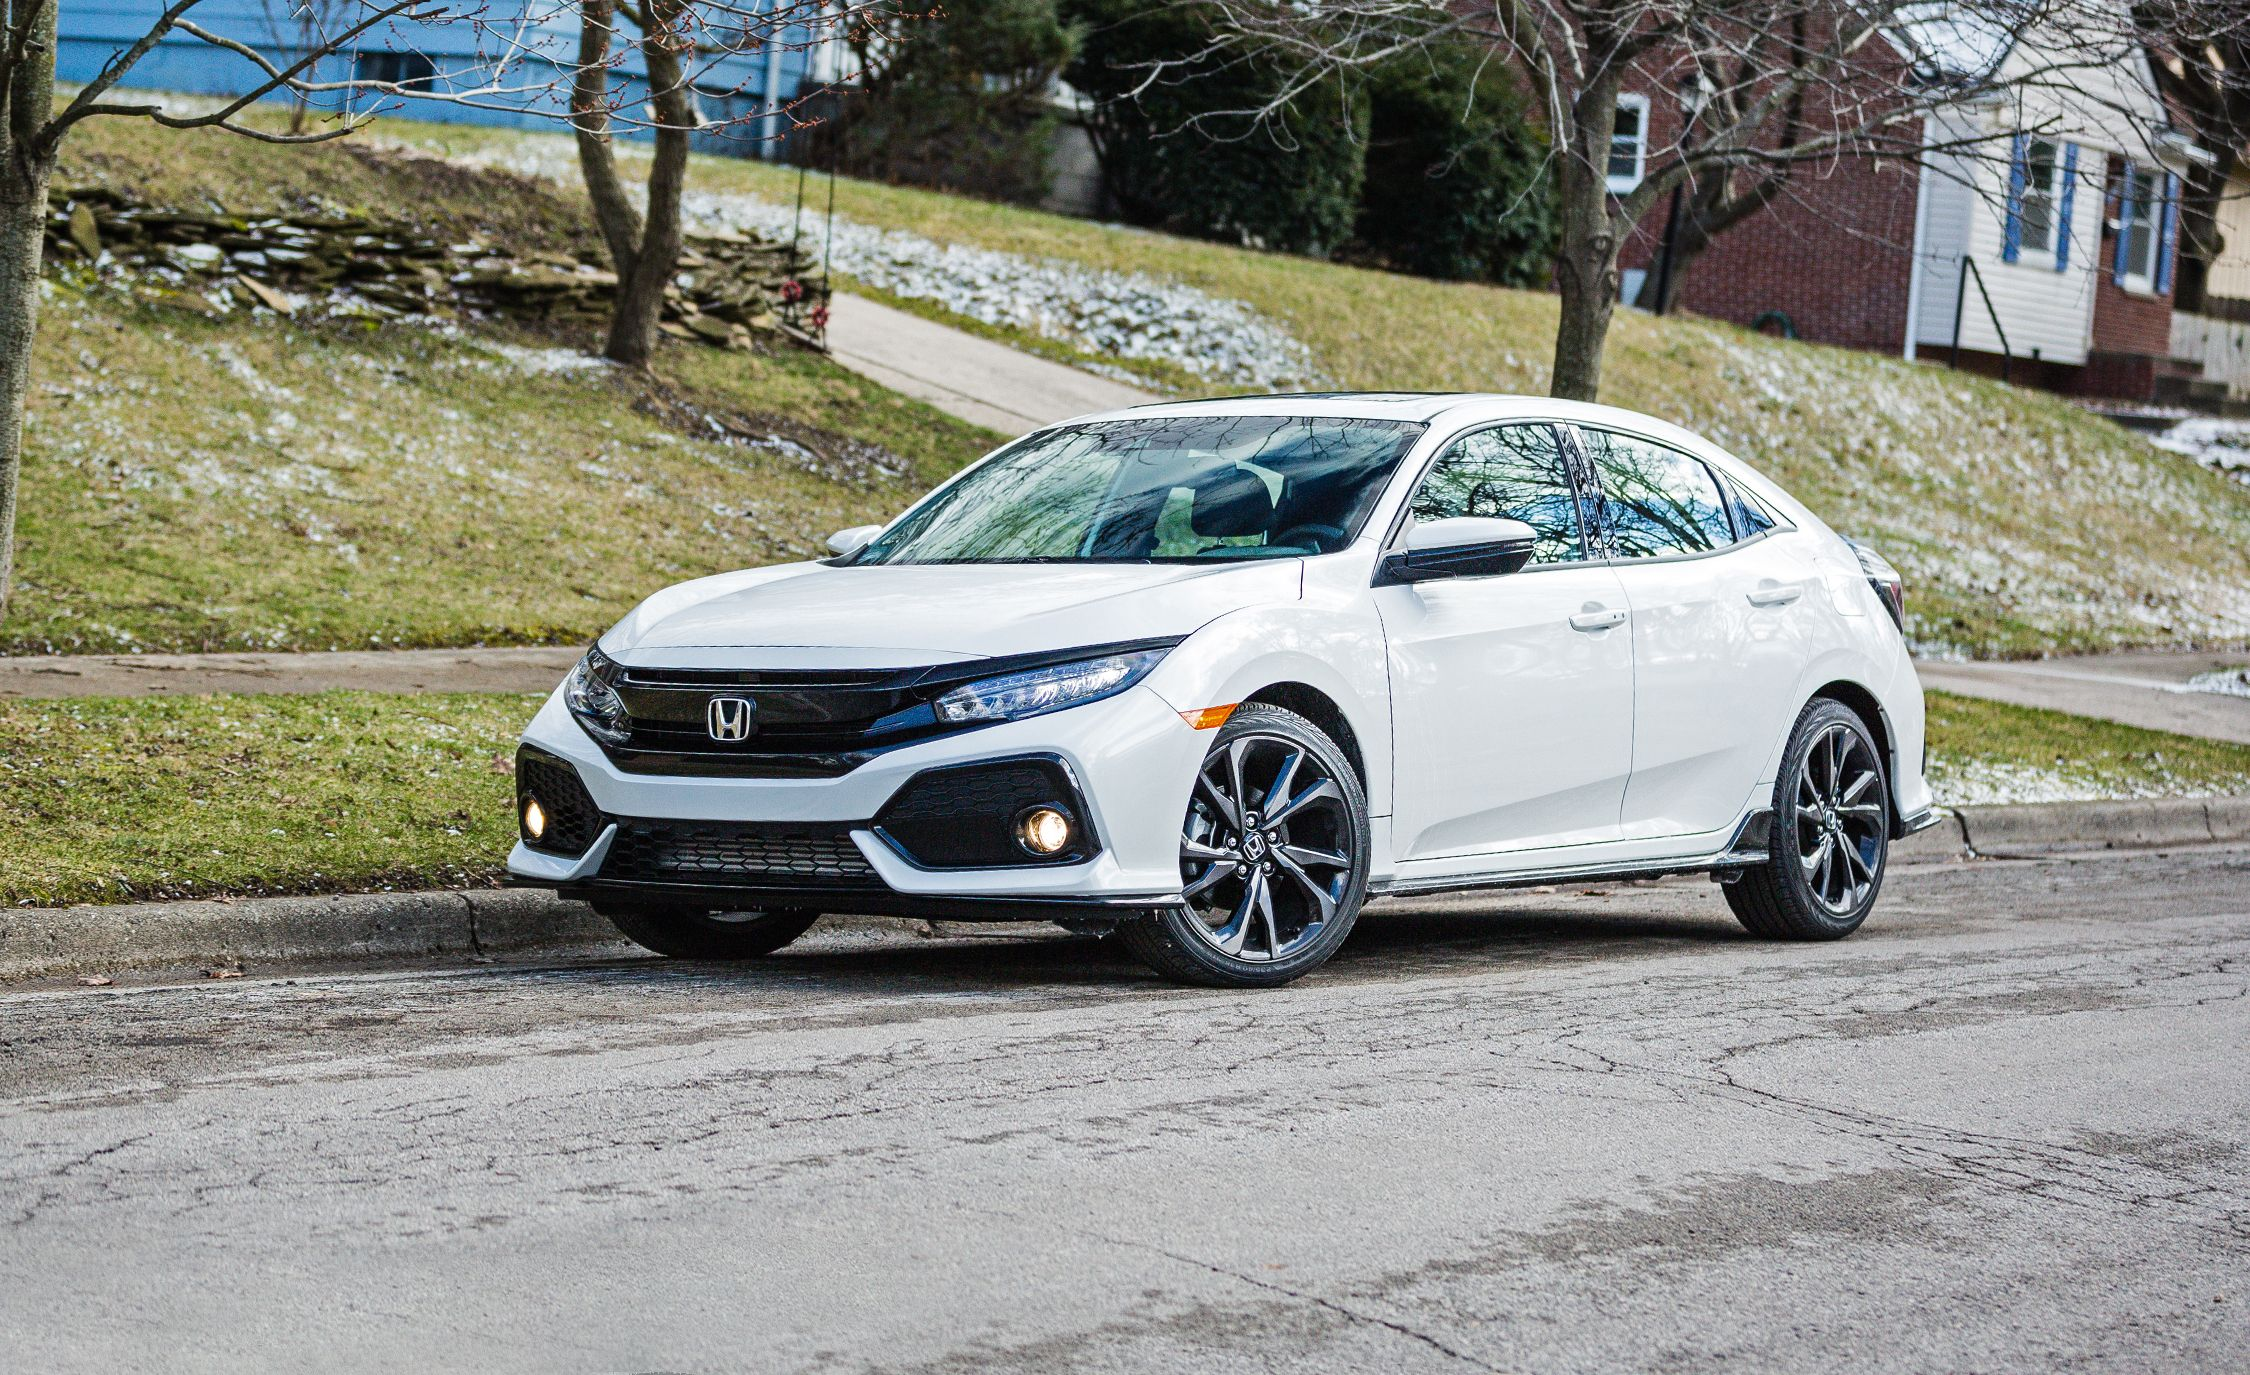 Honda Accord 2018 White >> 2018 Honda Civic | In-Depth Model Review | Car and Driver